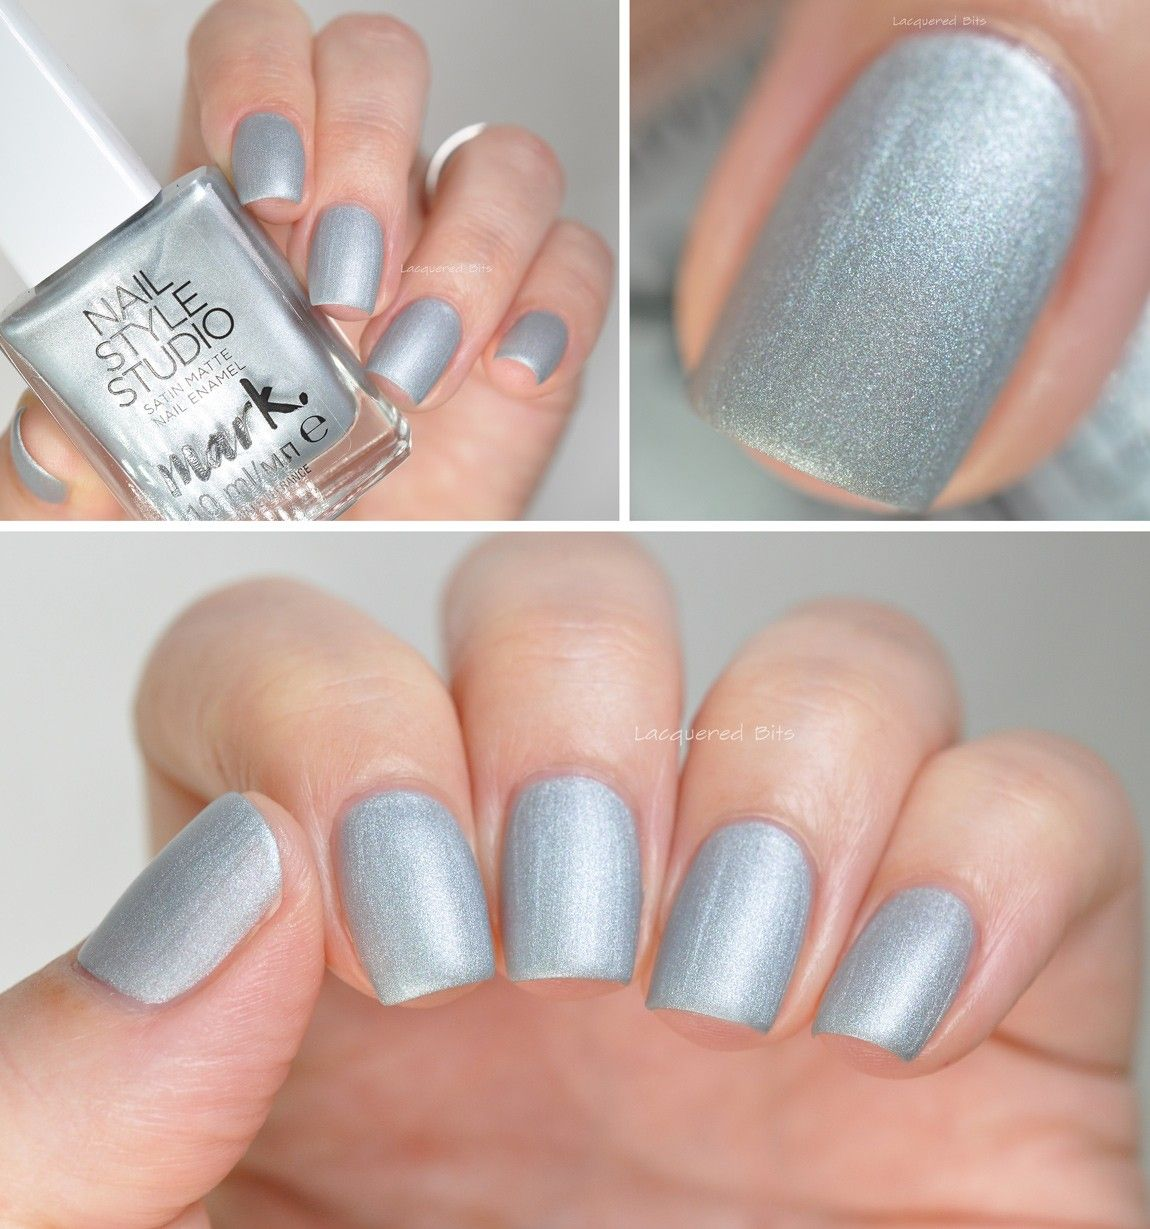 Disco Diva Avon Nails, Diva, Nail Polish, Polish, Manicures, Nail Polishes